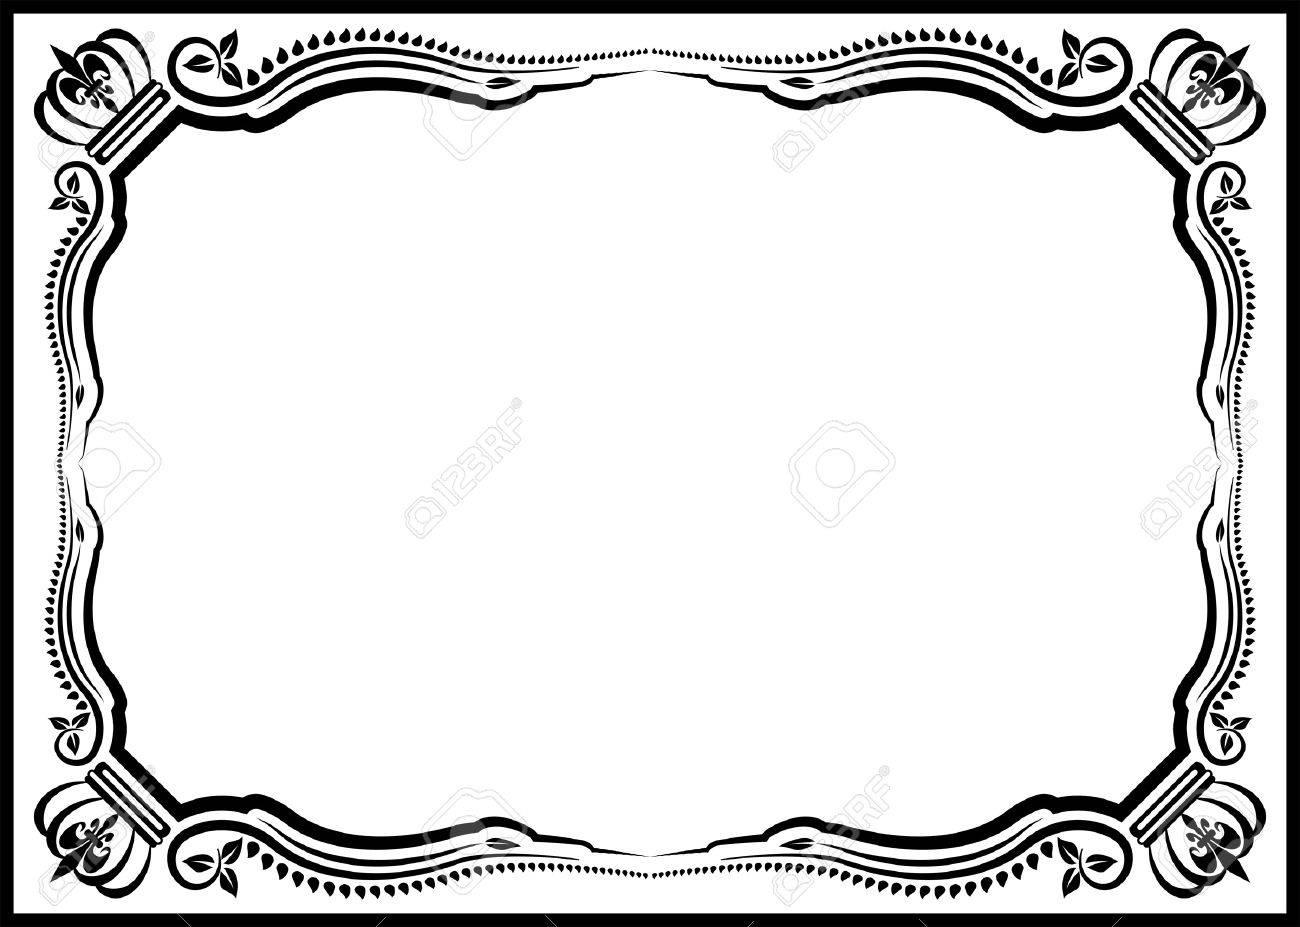 silhouette decorative border vector illustration royalty free rh 123rf com decorative circle border vector decorative border corners vector